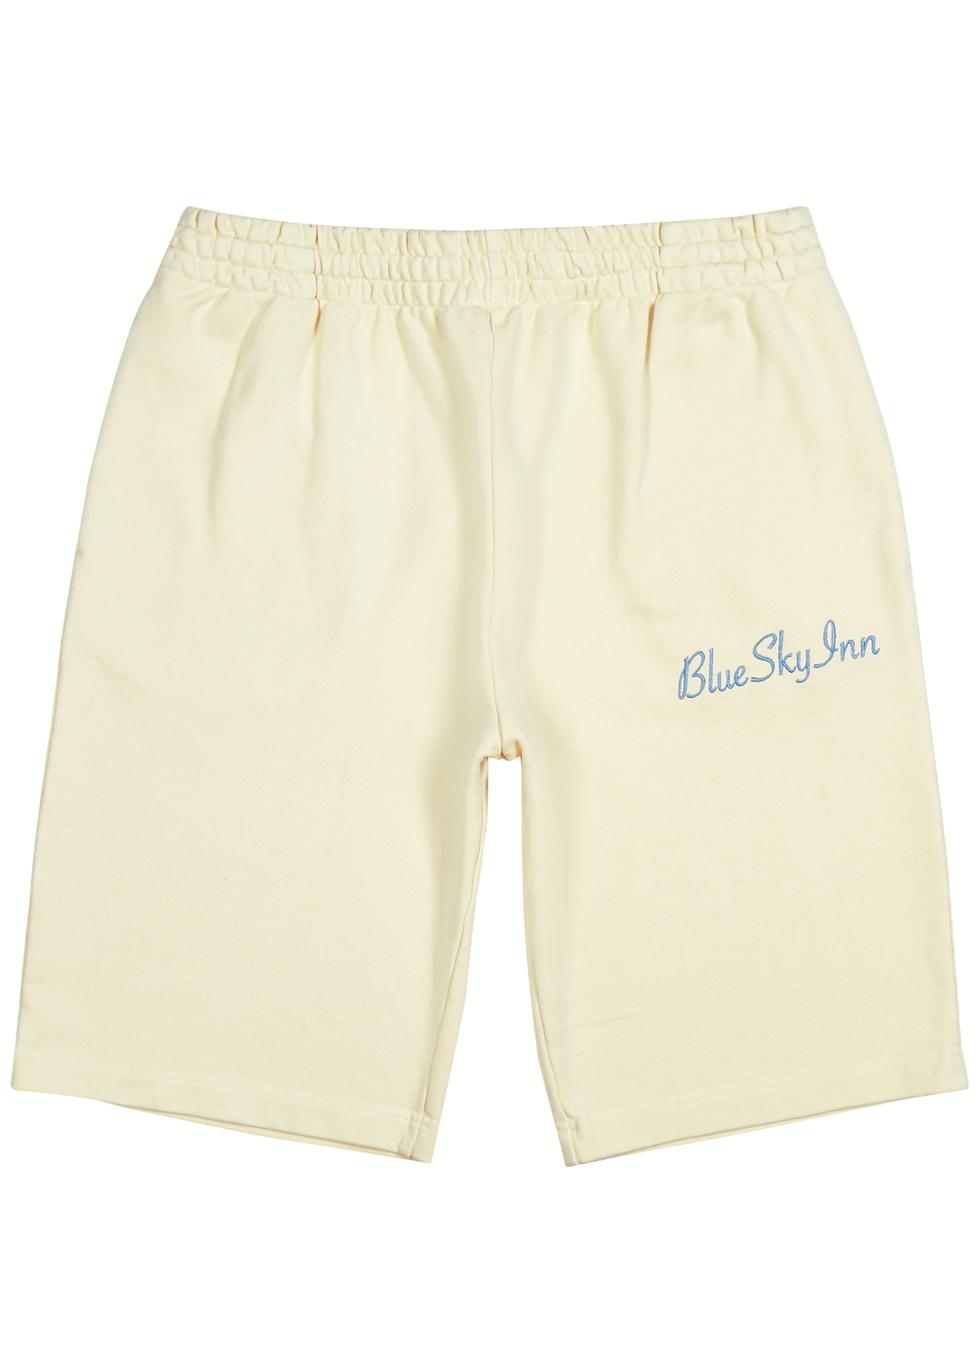 Cream logo-embroidered cotton shorts